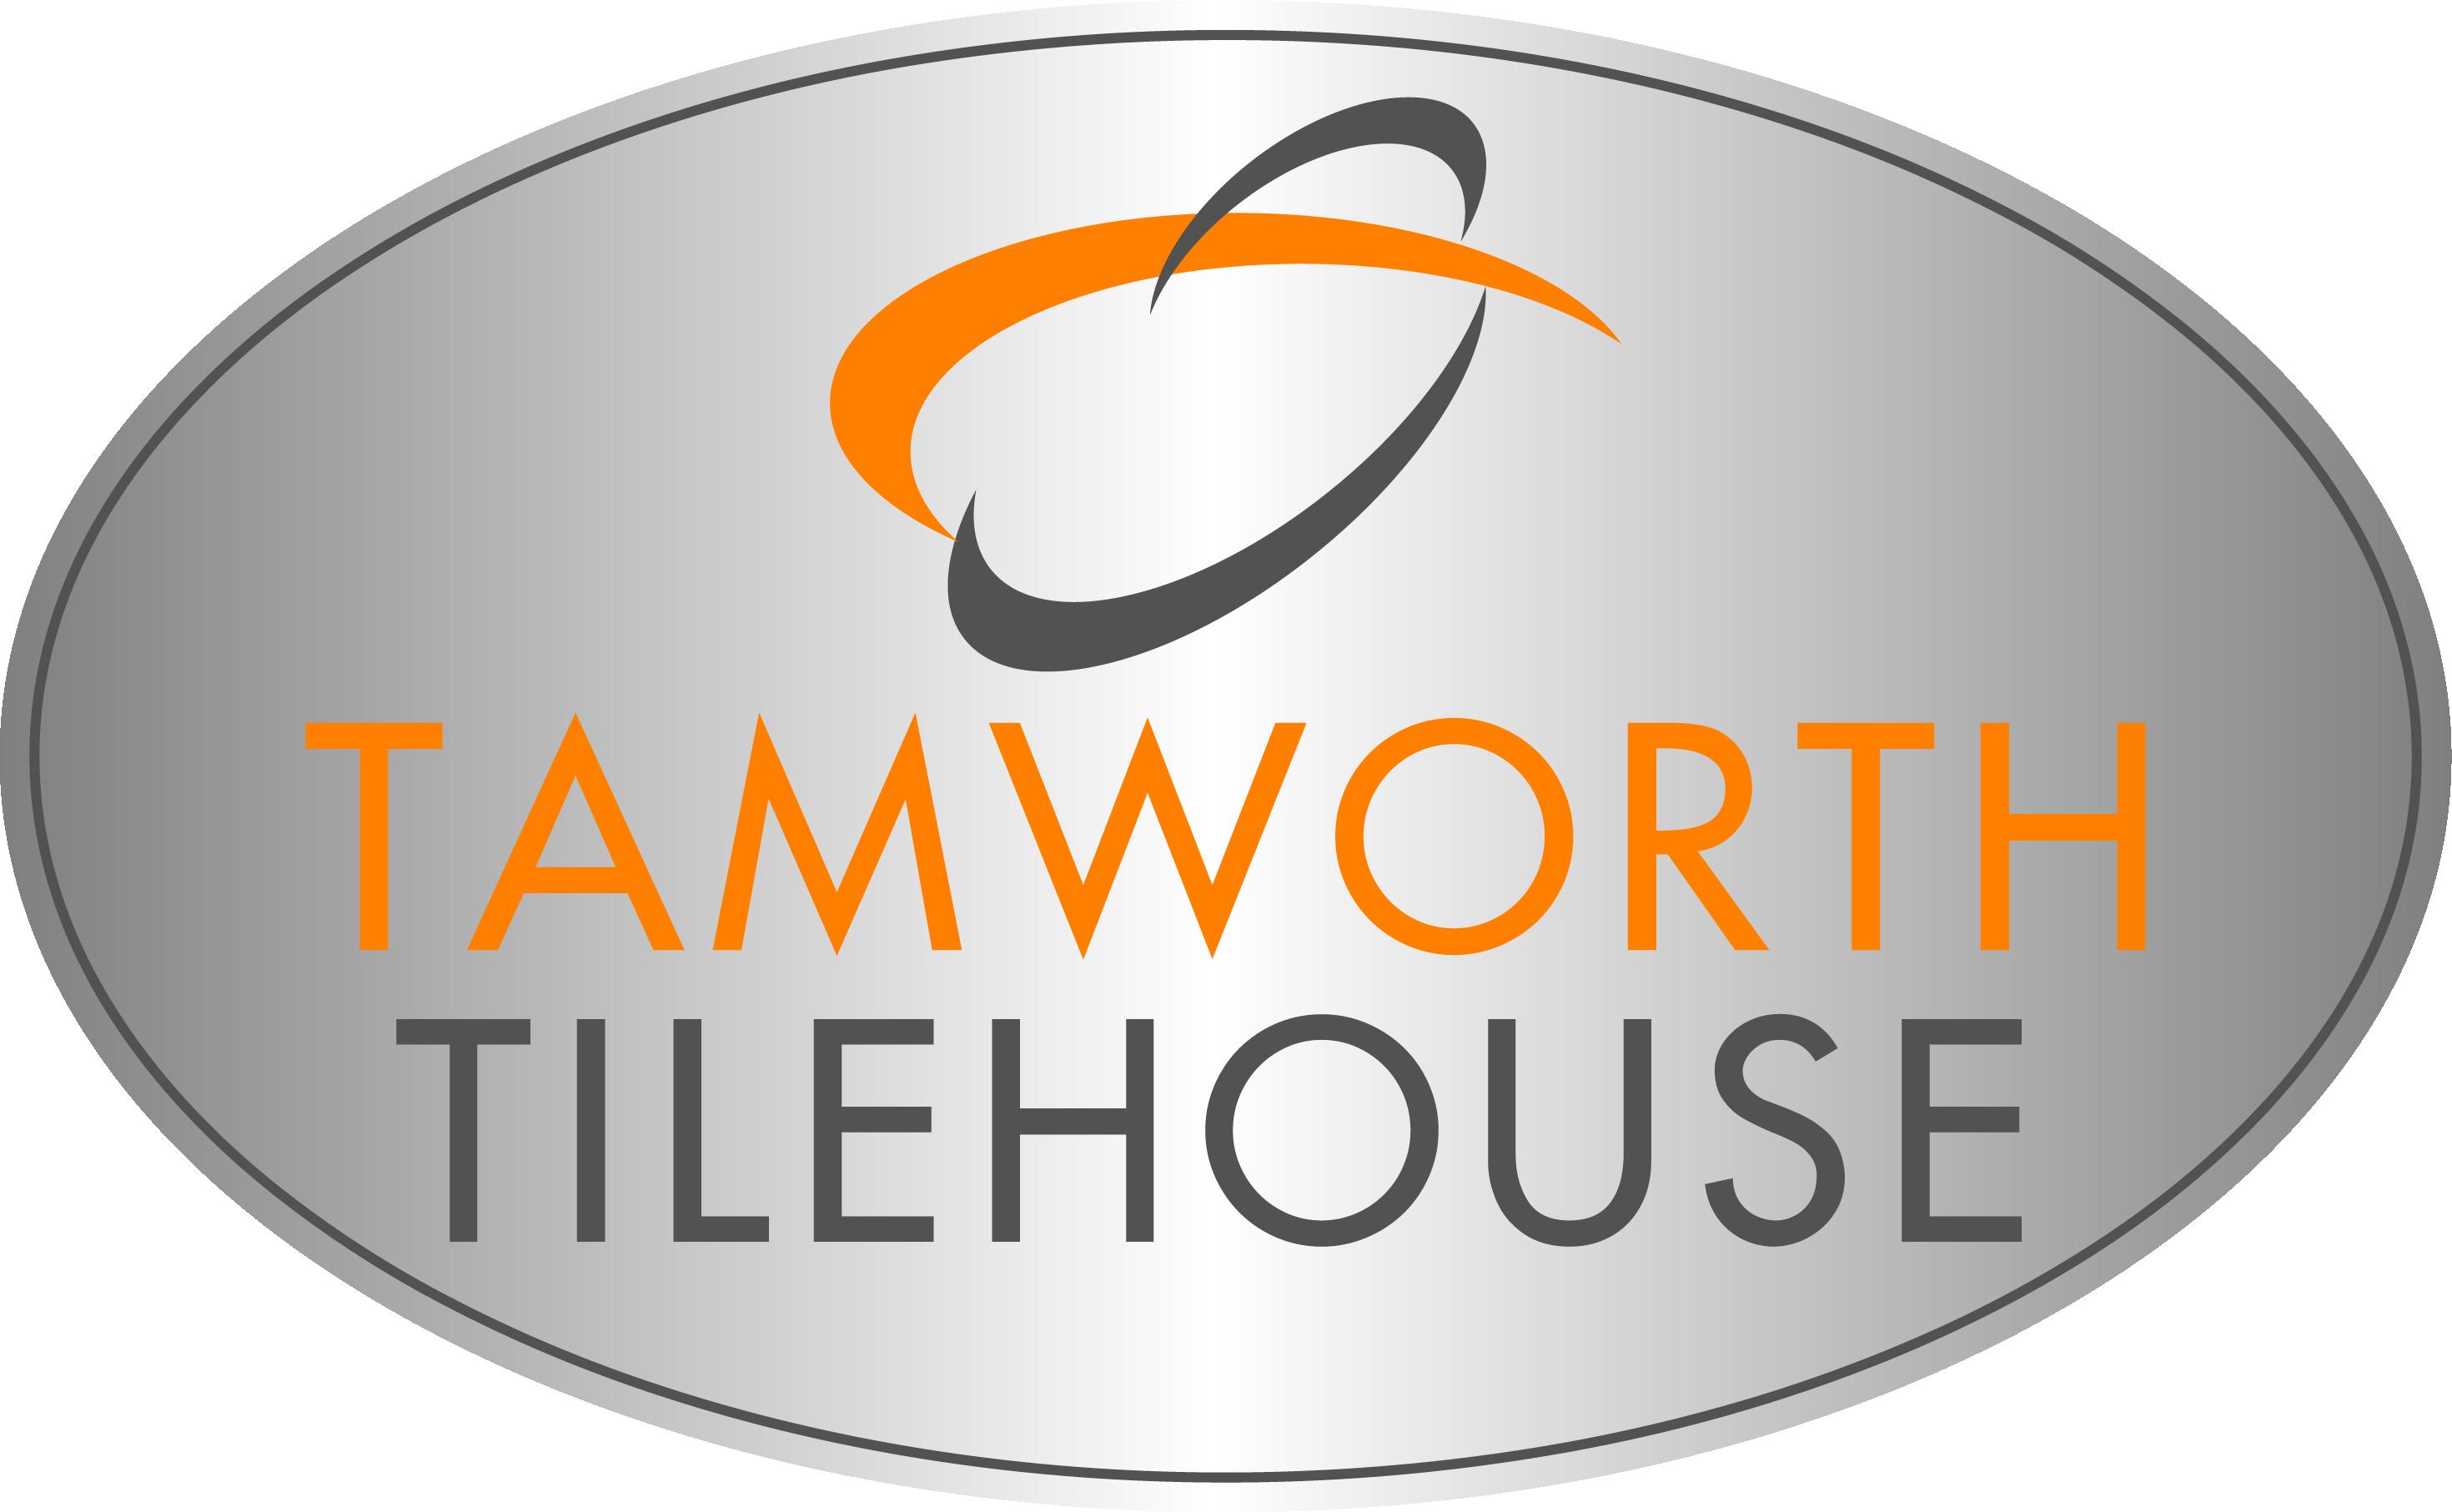 Tamworth Tilehouse Logo